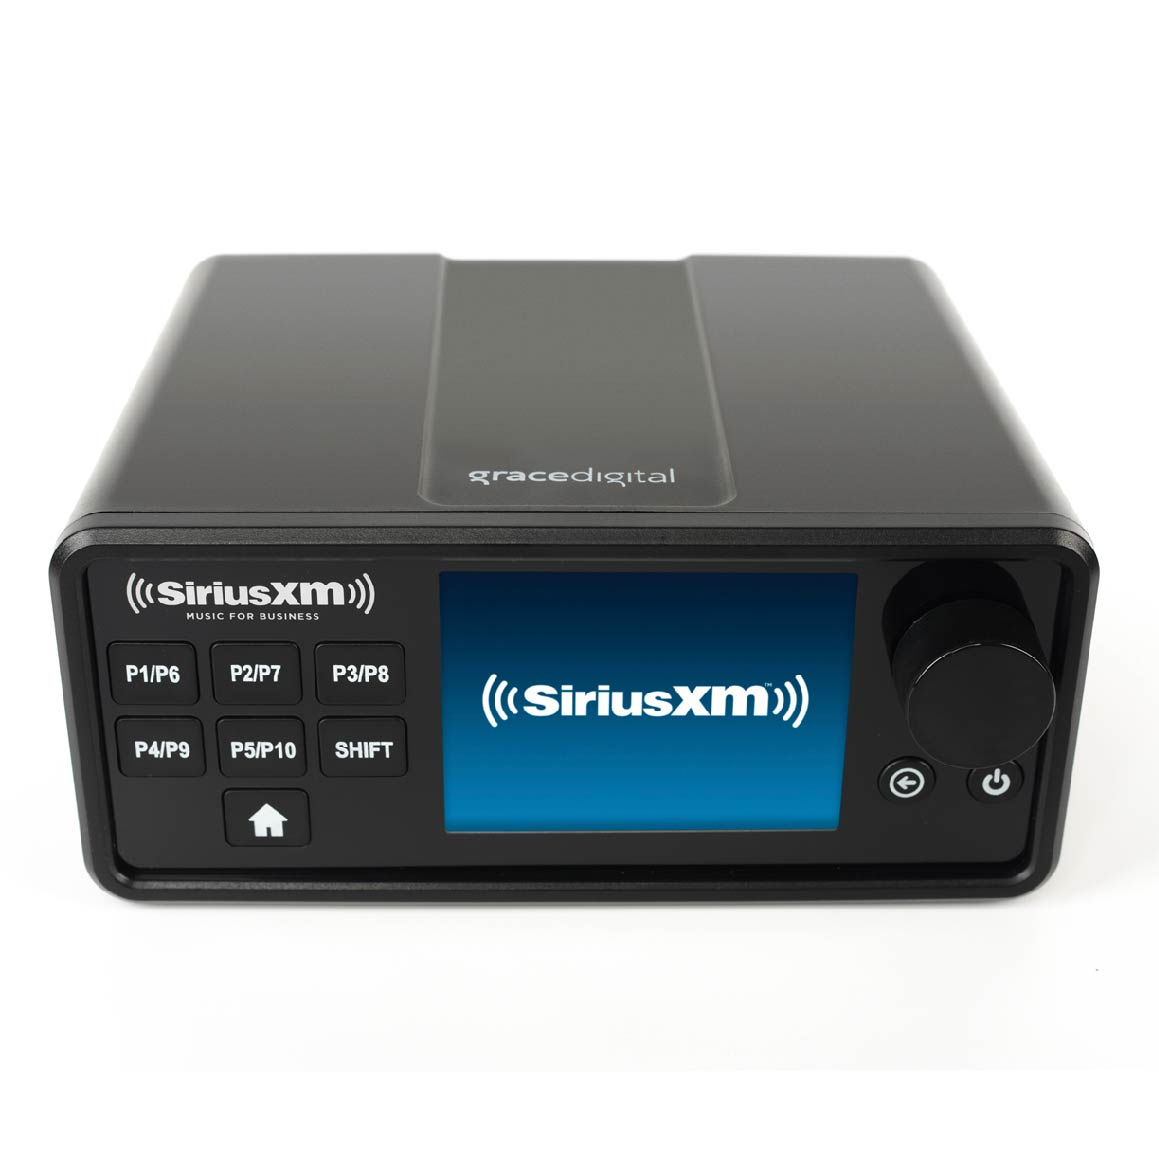 Shop SiriusXM - SiriusXM Music for Business Internet Radio - ONE_SIZE-IMAGE01